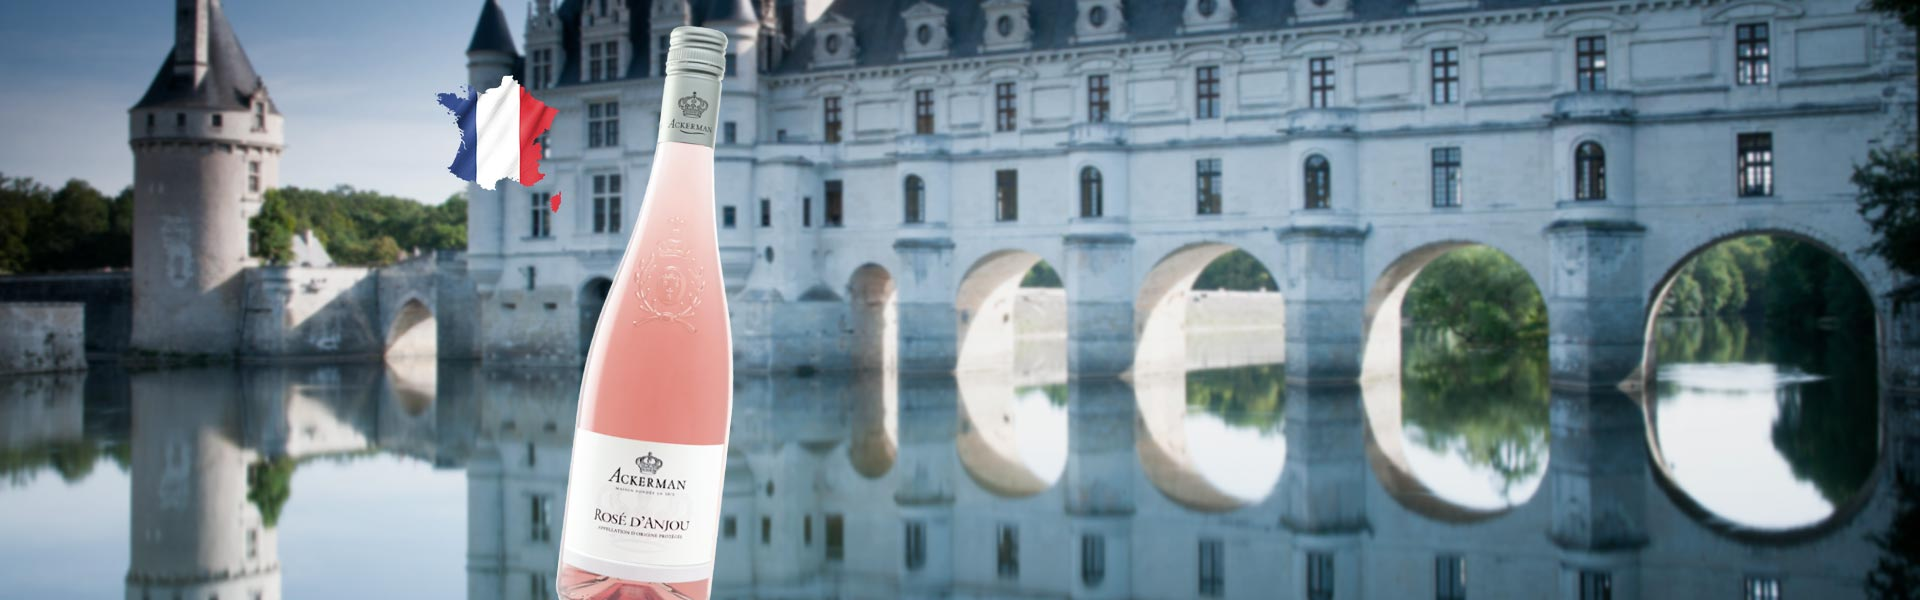 2016 Rosé d'Anjou AOP